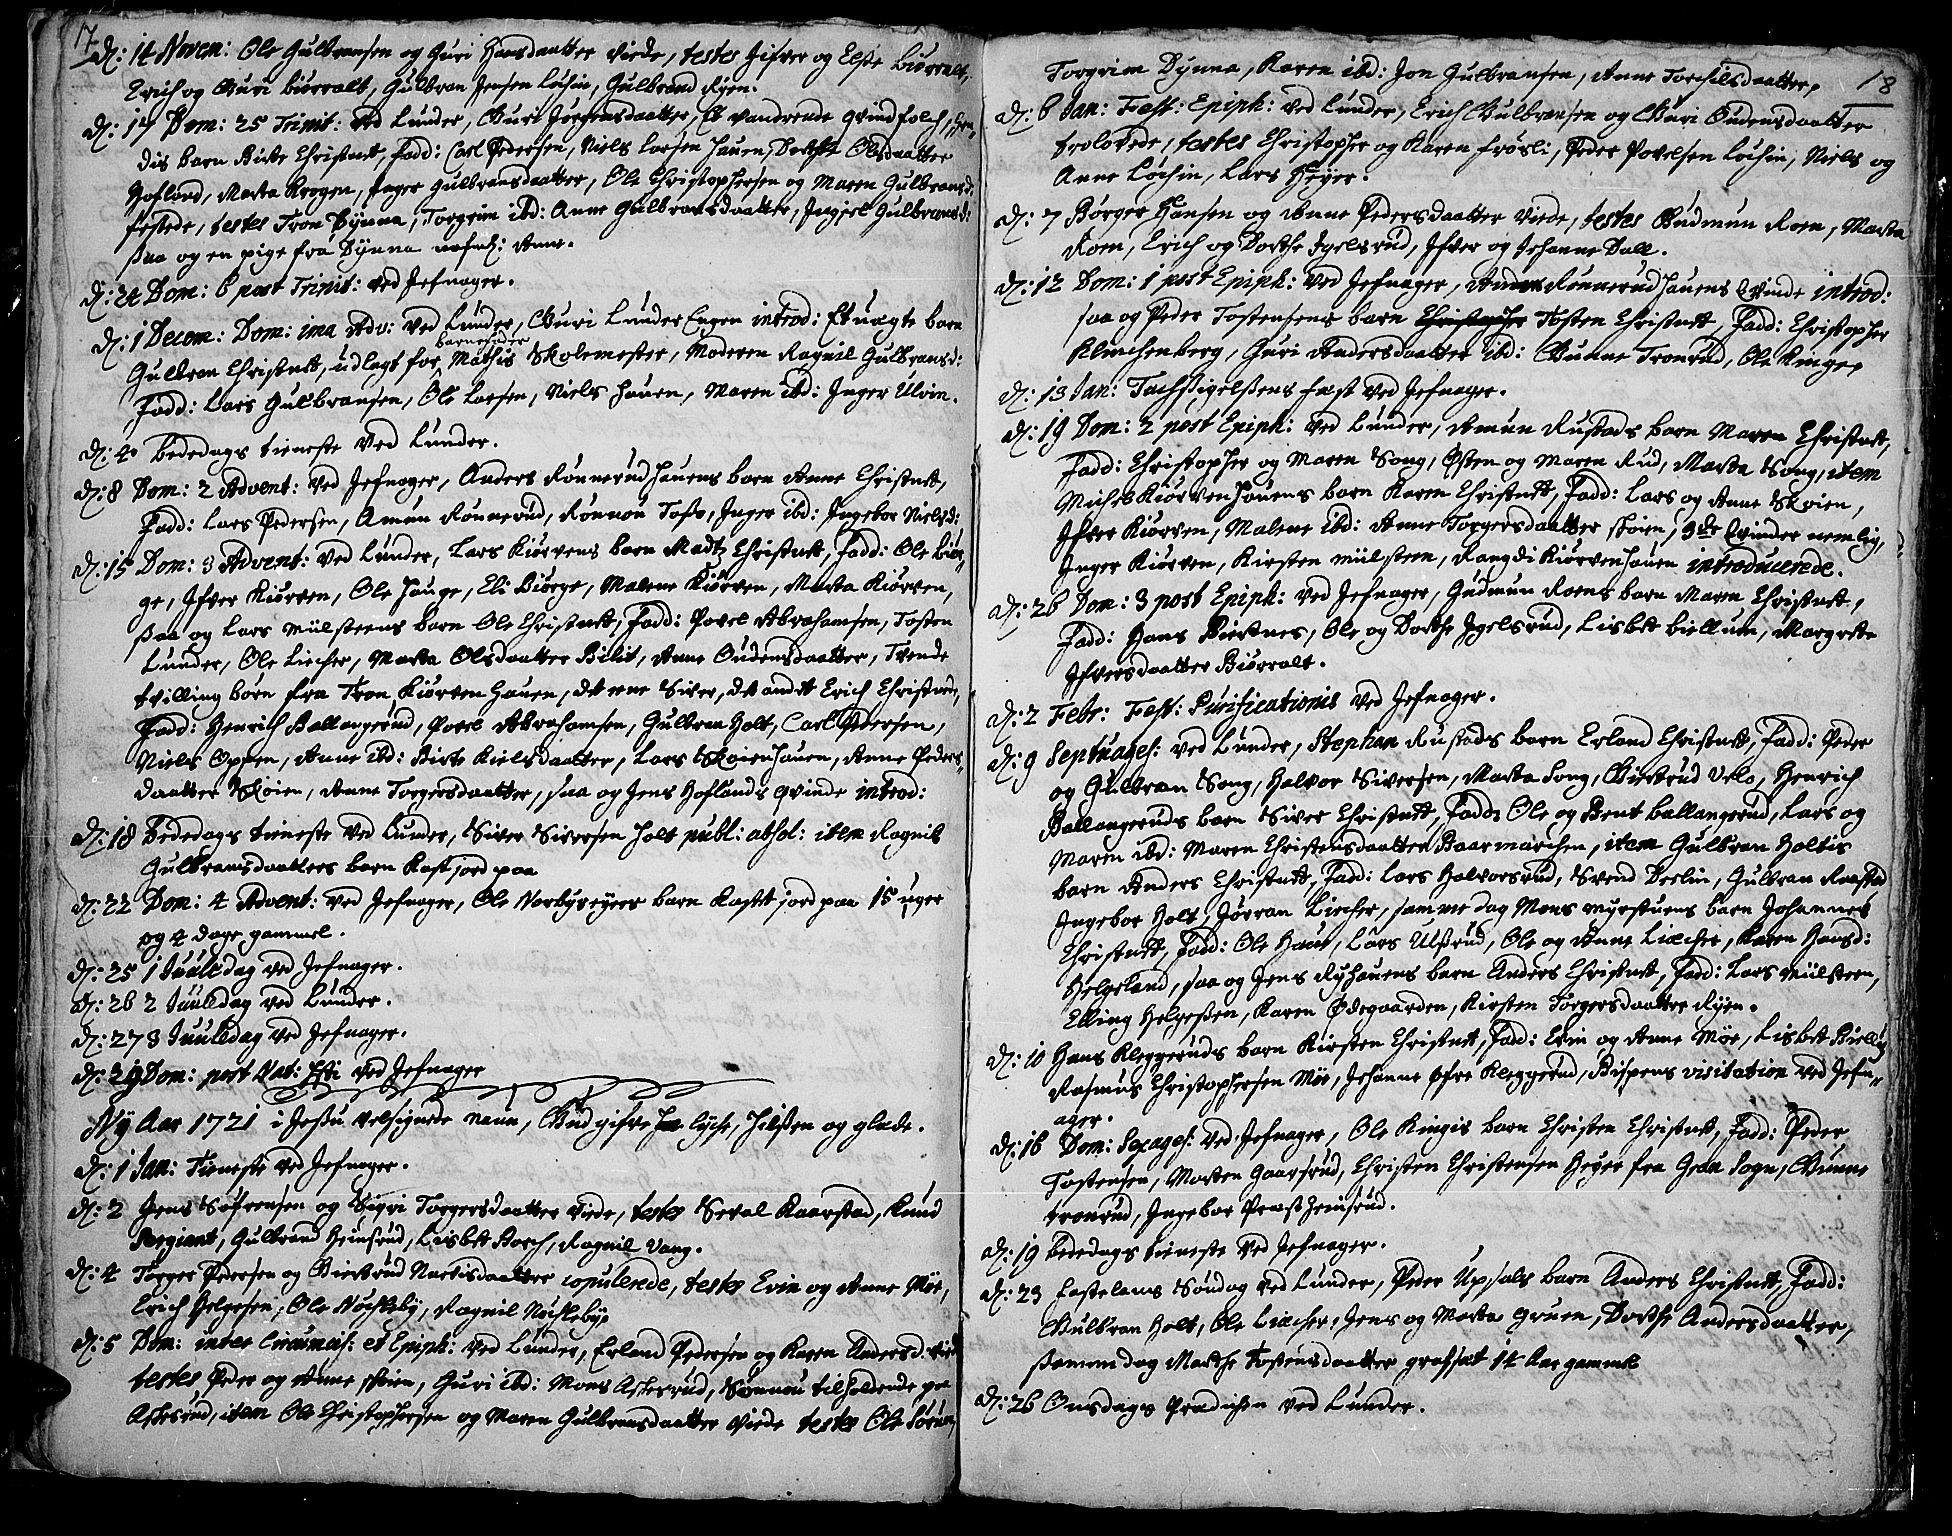 SAH, Jevnaker prestekontor, Ministerialbok nr. 1, 1718-1725, s. 17-18